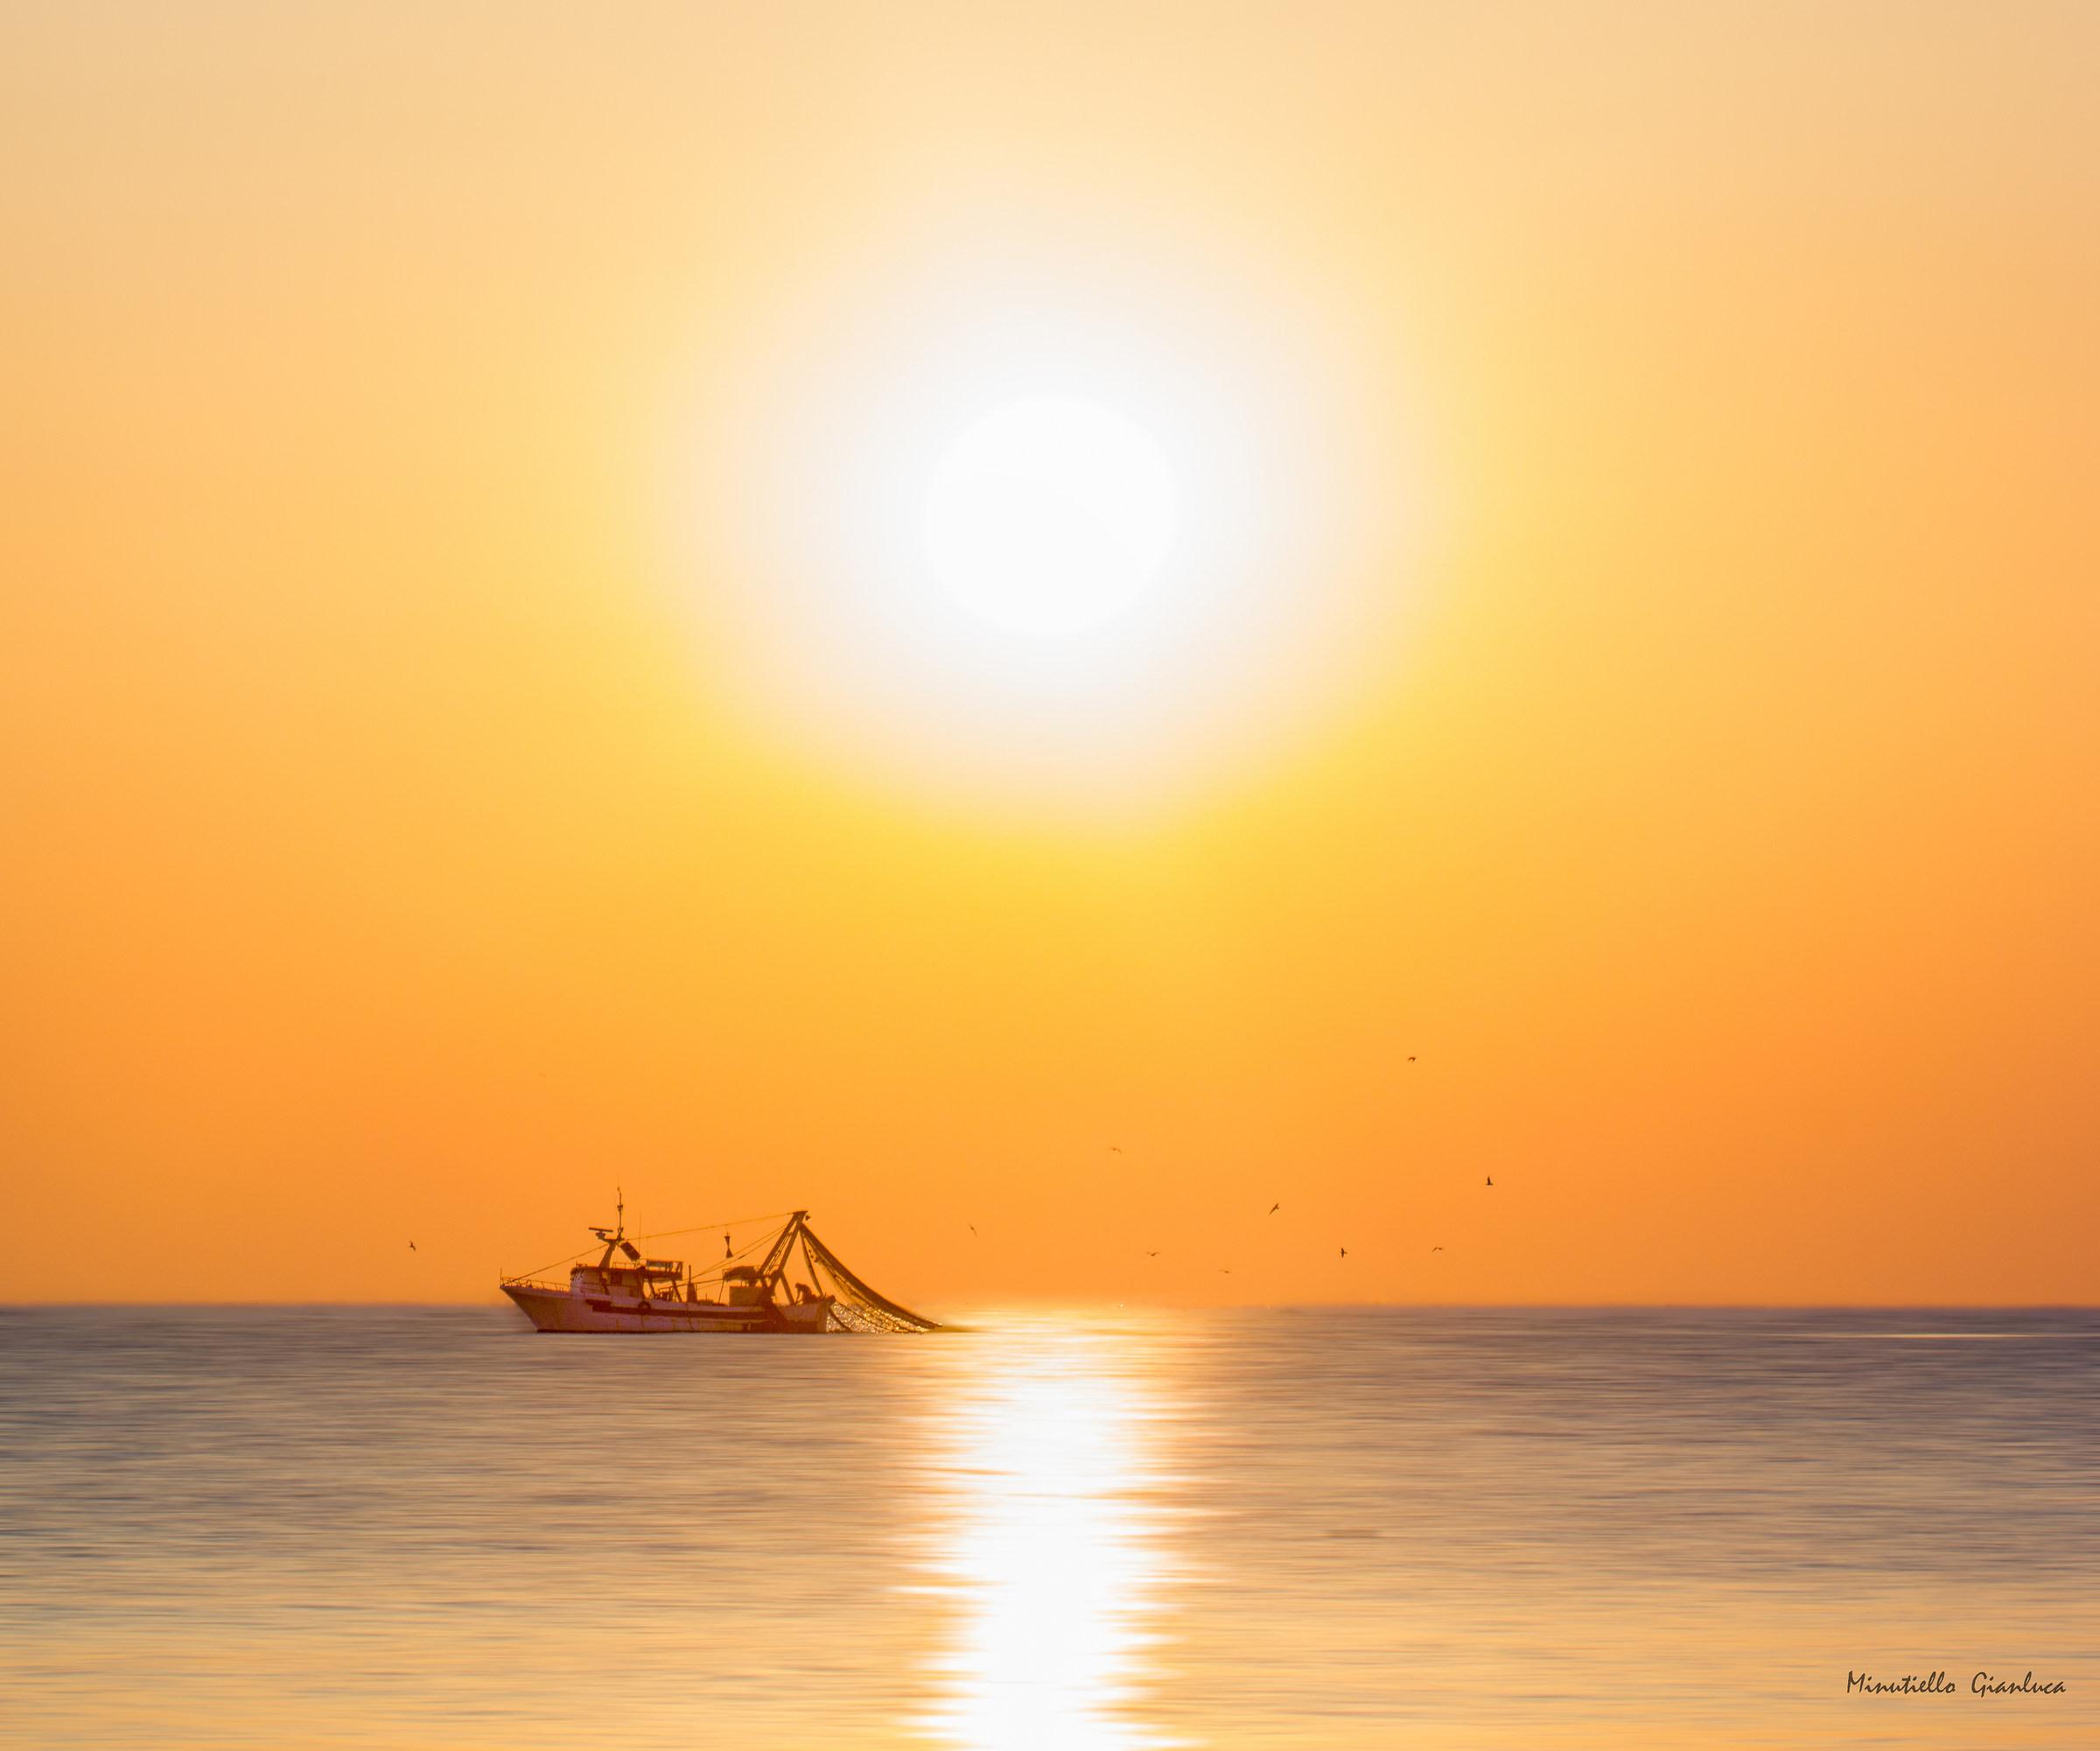 The fisherman dreams...